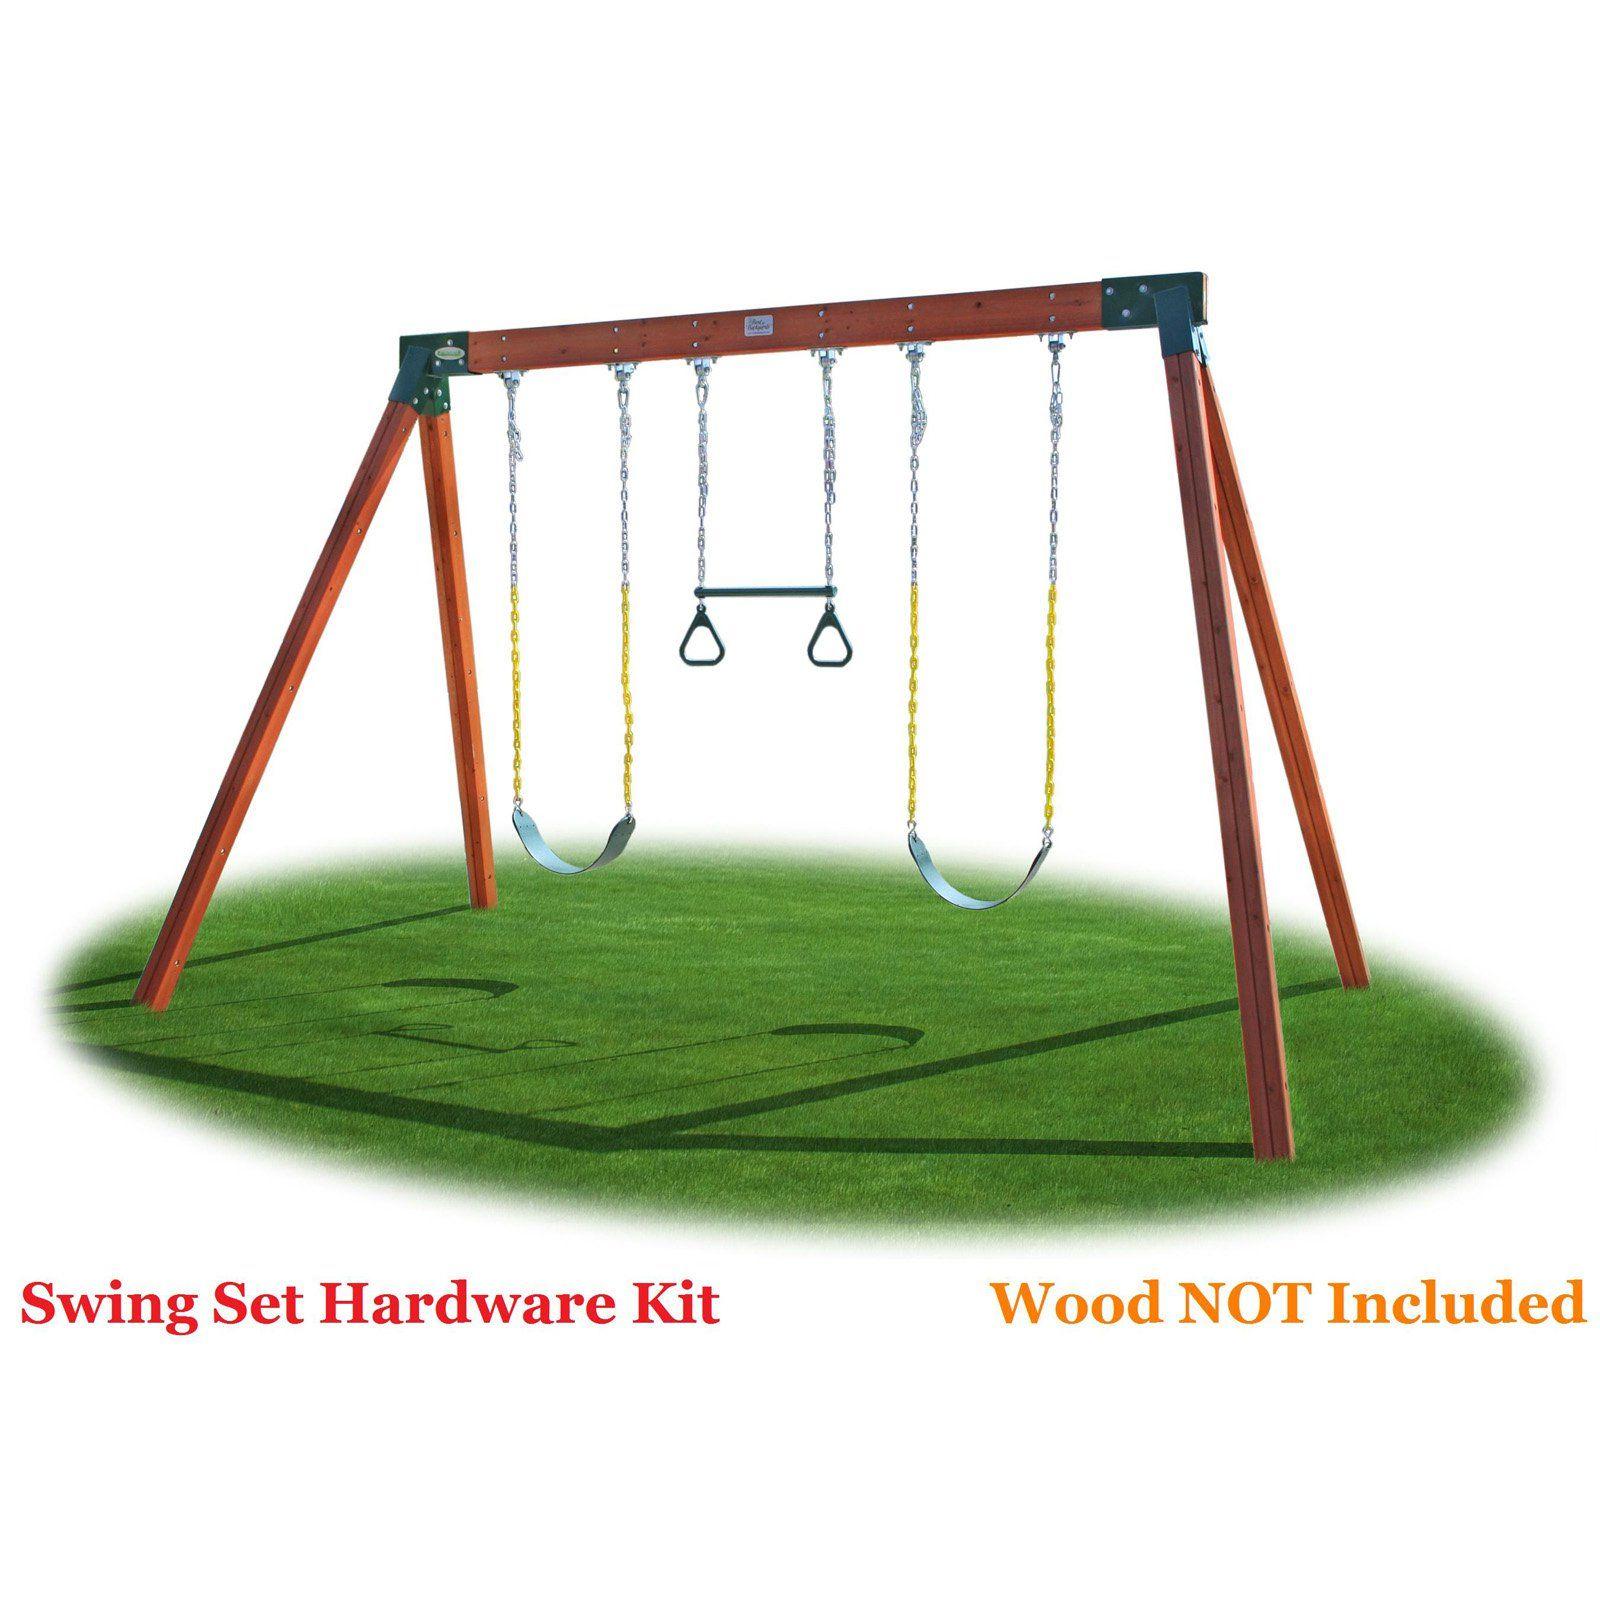 Eastern Jungle Gym Classic A Frame Swing Set Hardware Kit Classic Hardware Kit A Frame Swing Set A Frame Swing Swing Set